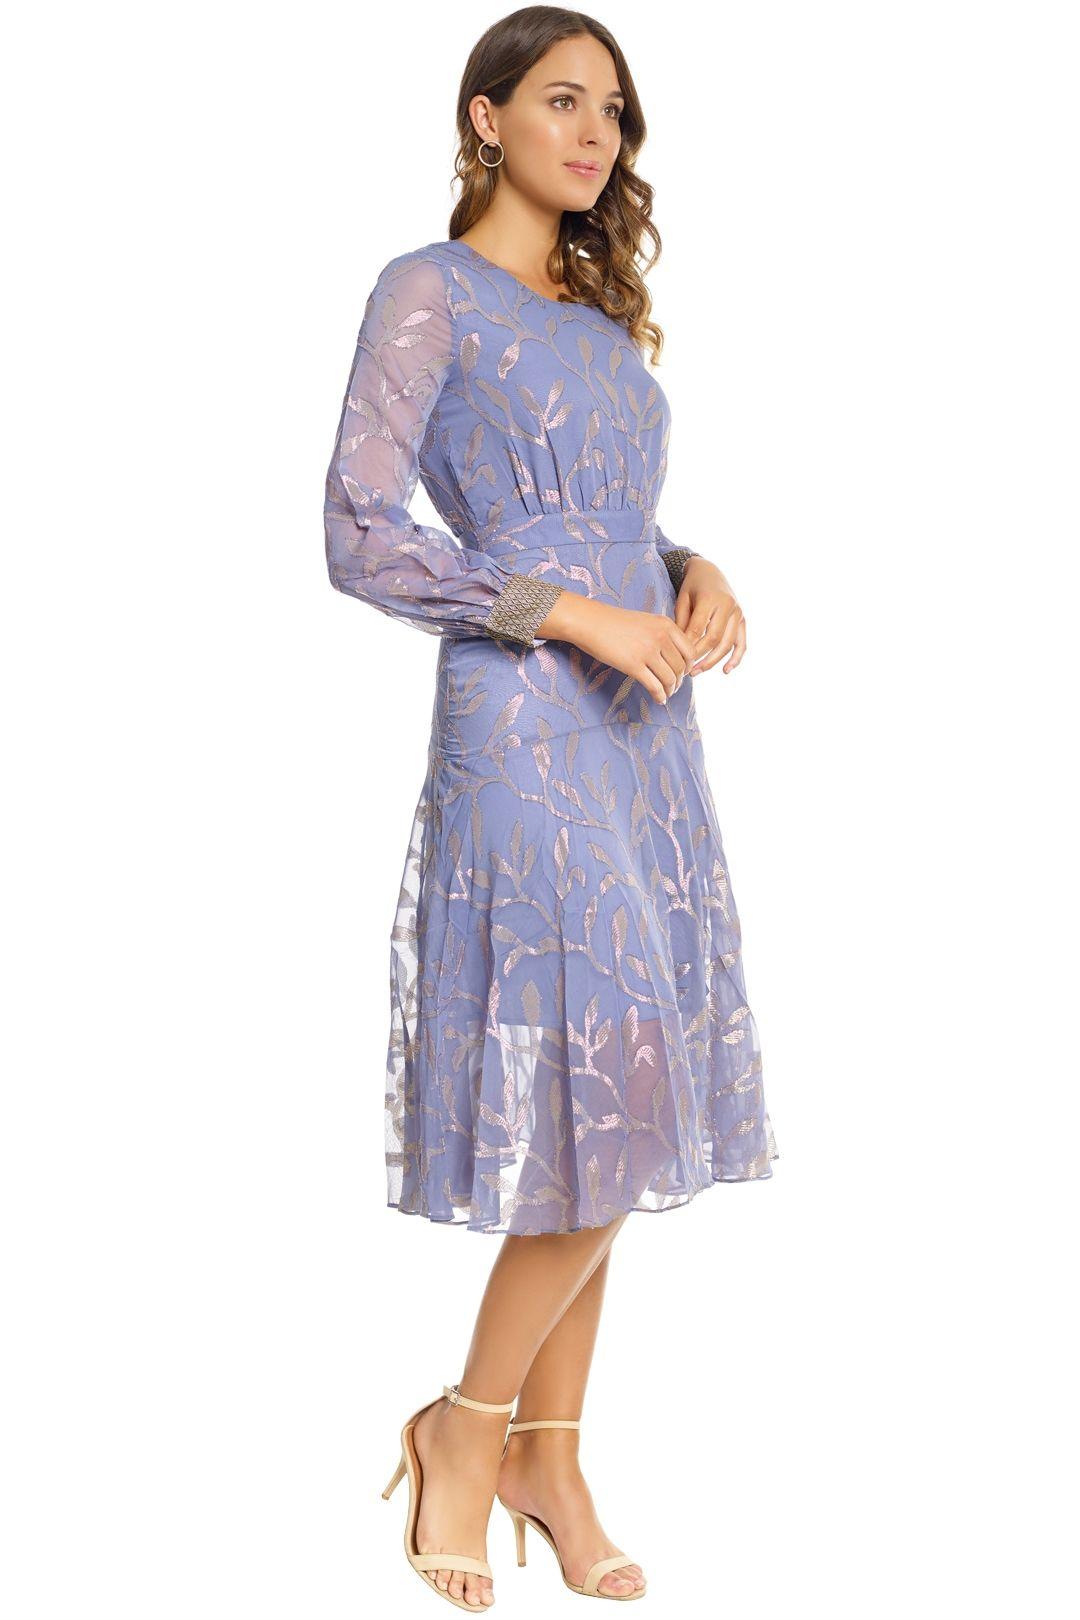 We Are Kindred - Luella Leaf Dress - Steele - Side